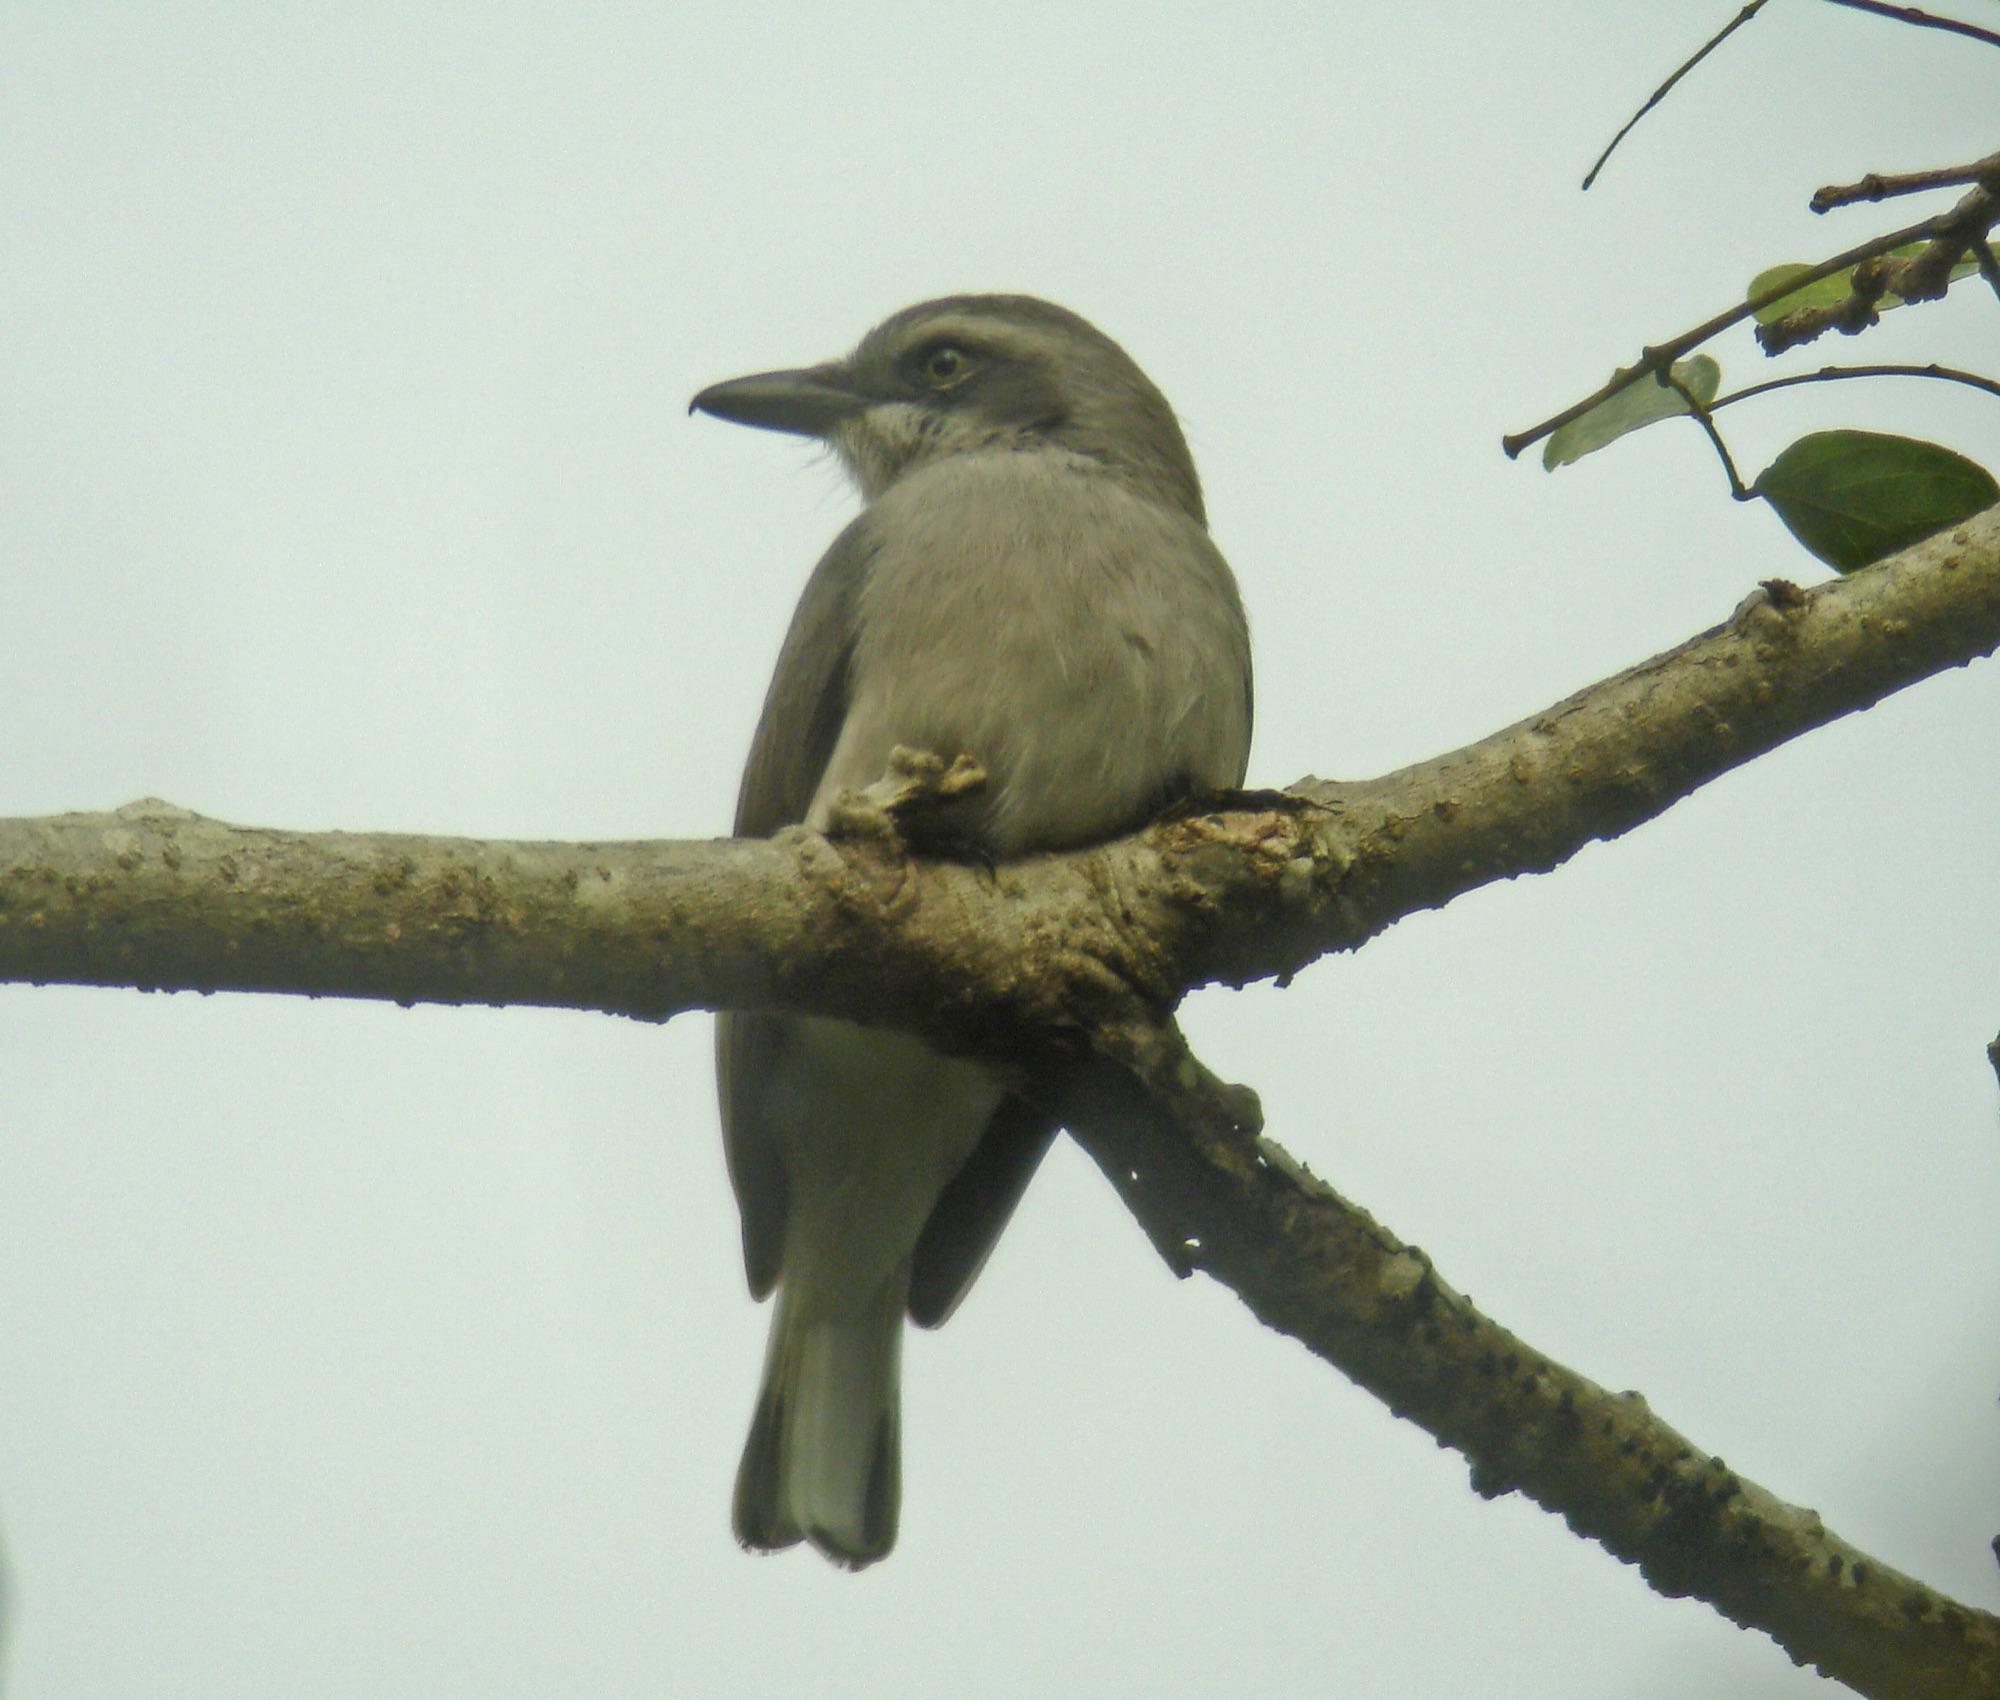 Ceylon Woodshrike